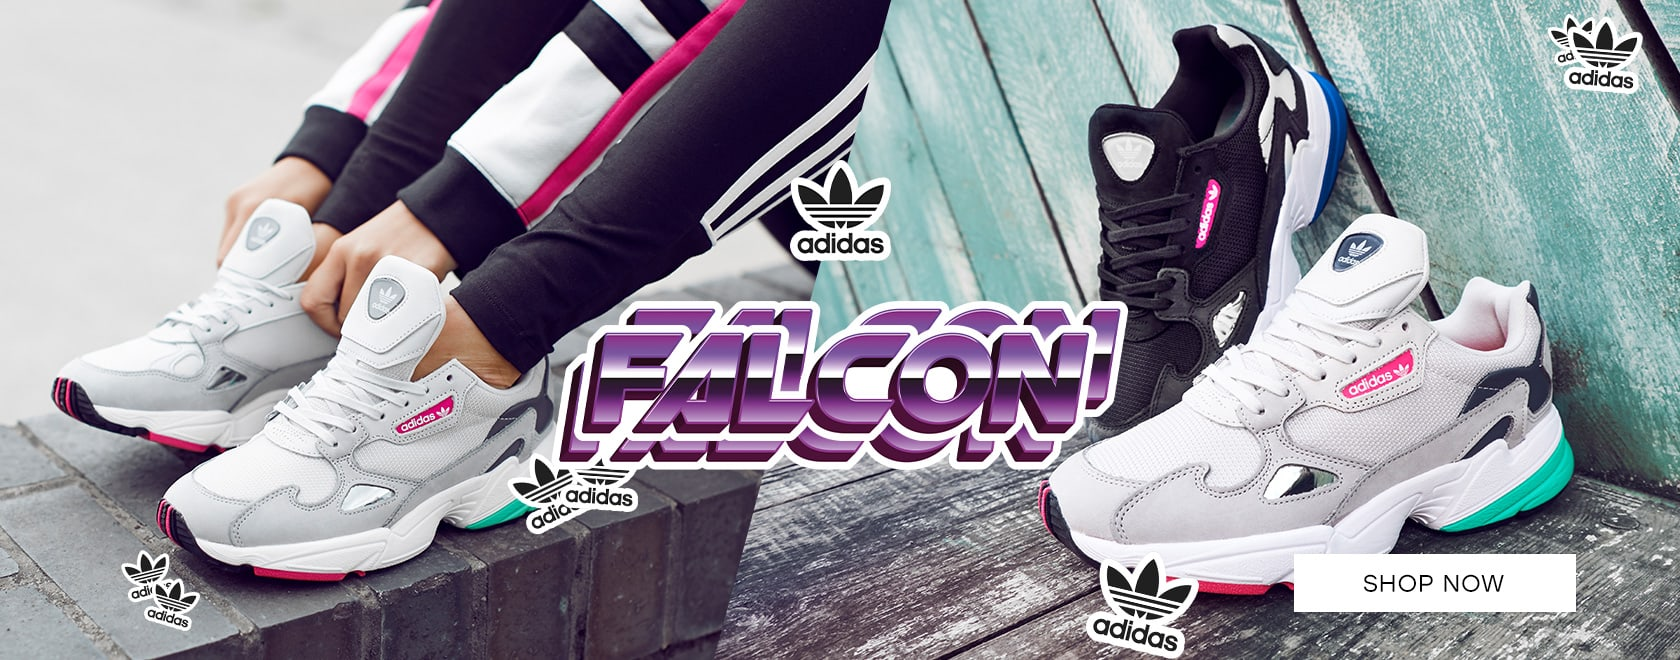 adidas Originals Falcon